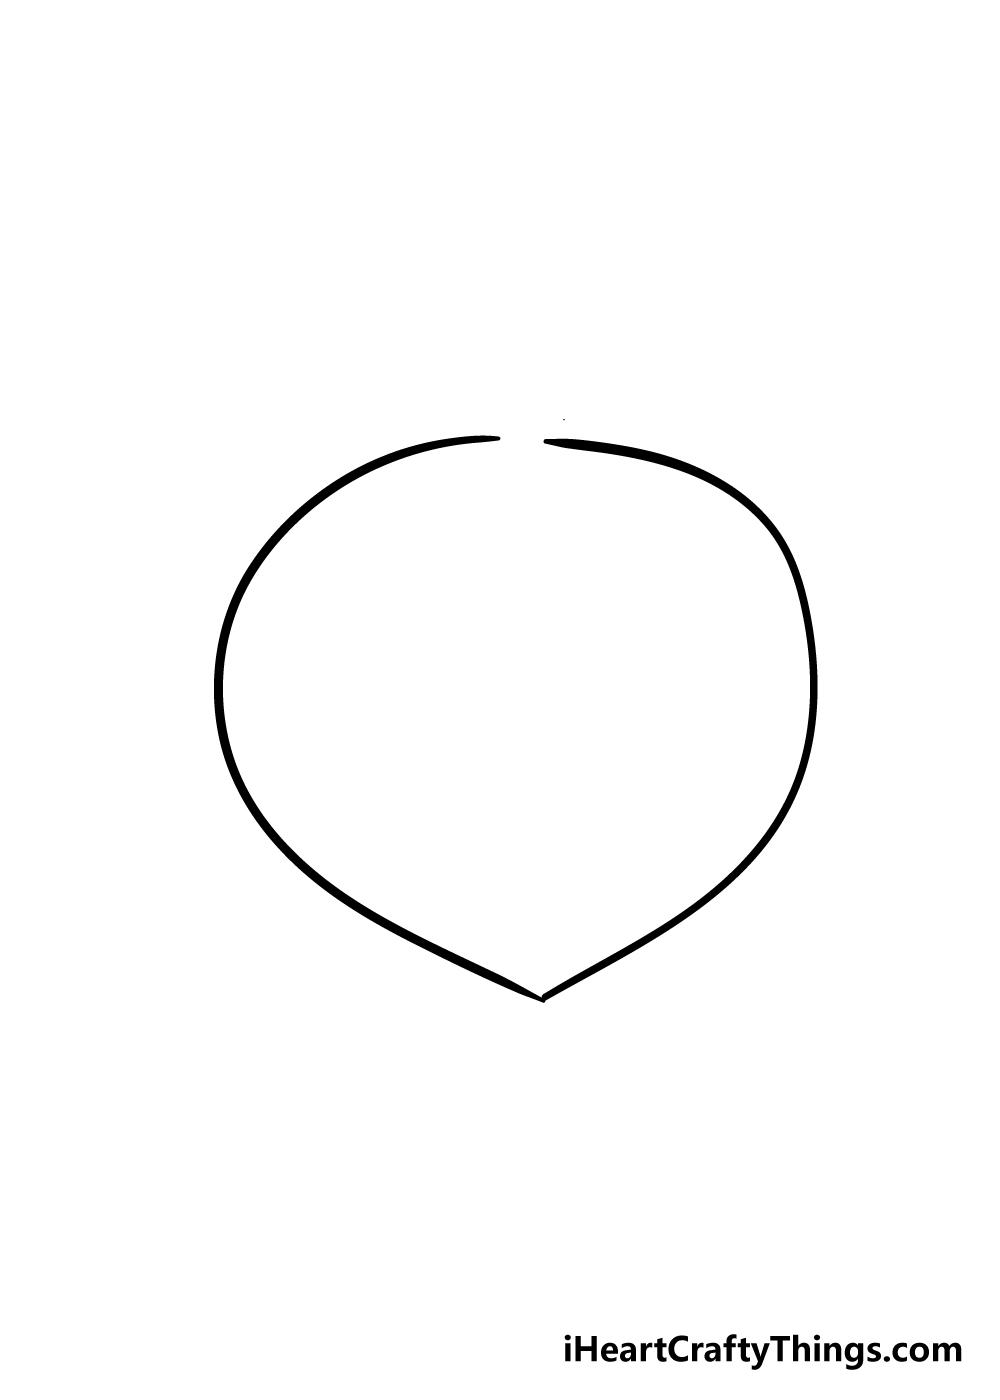 peach drawing step 1